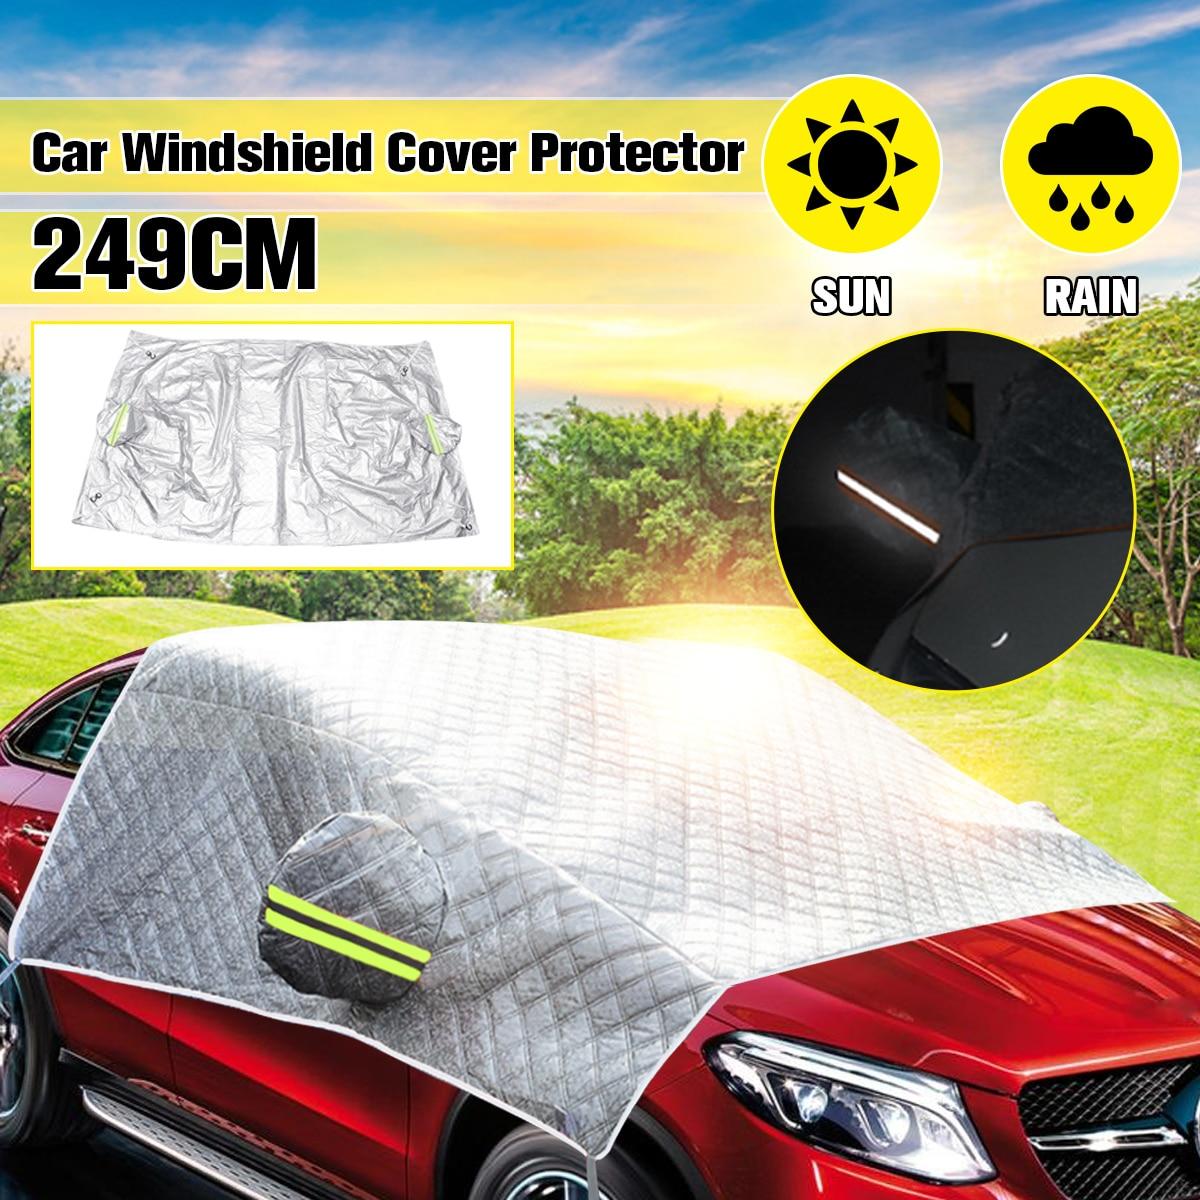 Universal Car Cover Windshield Mirror Reflective Bar Sun Shade Ice Hot Rain Dust Frost Guard Aluminium Film Sun Shelter Car Covers Automobiles & Motorcycles - title=